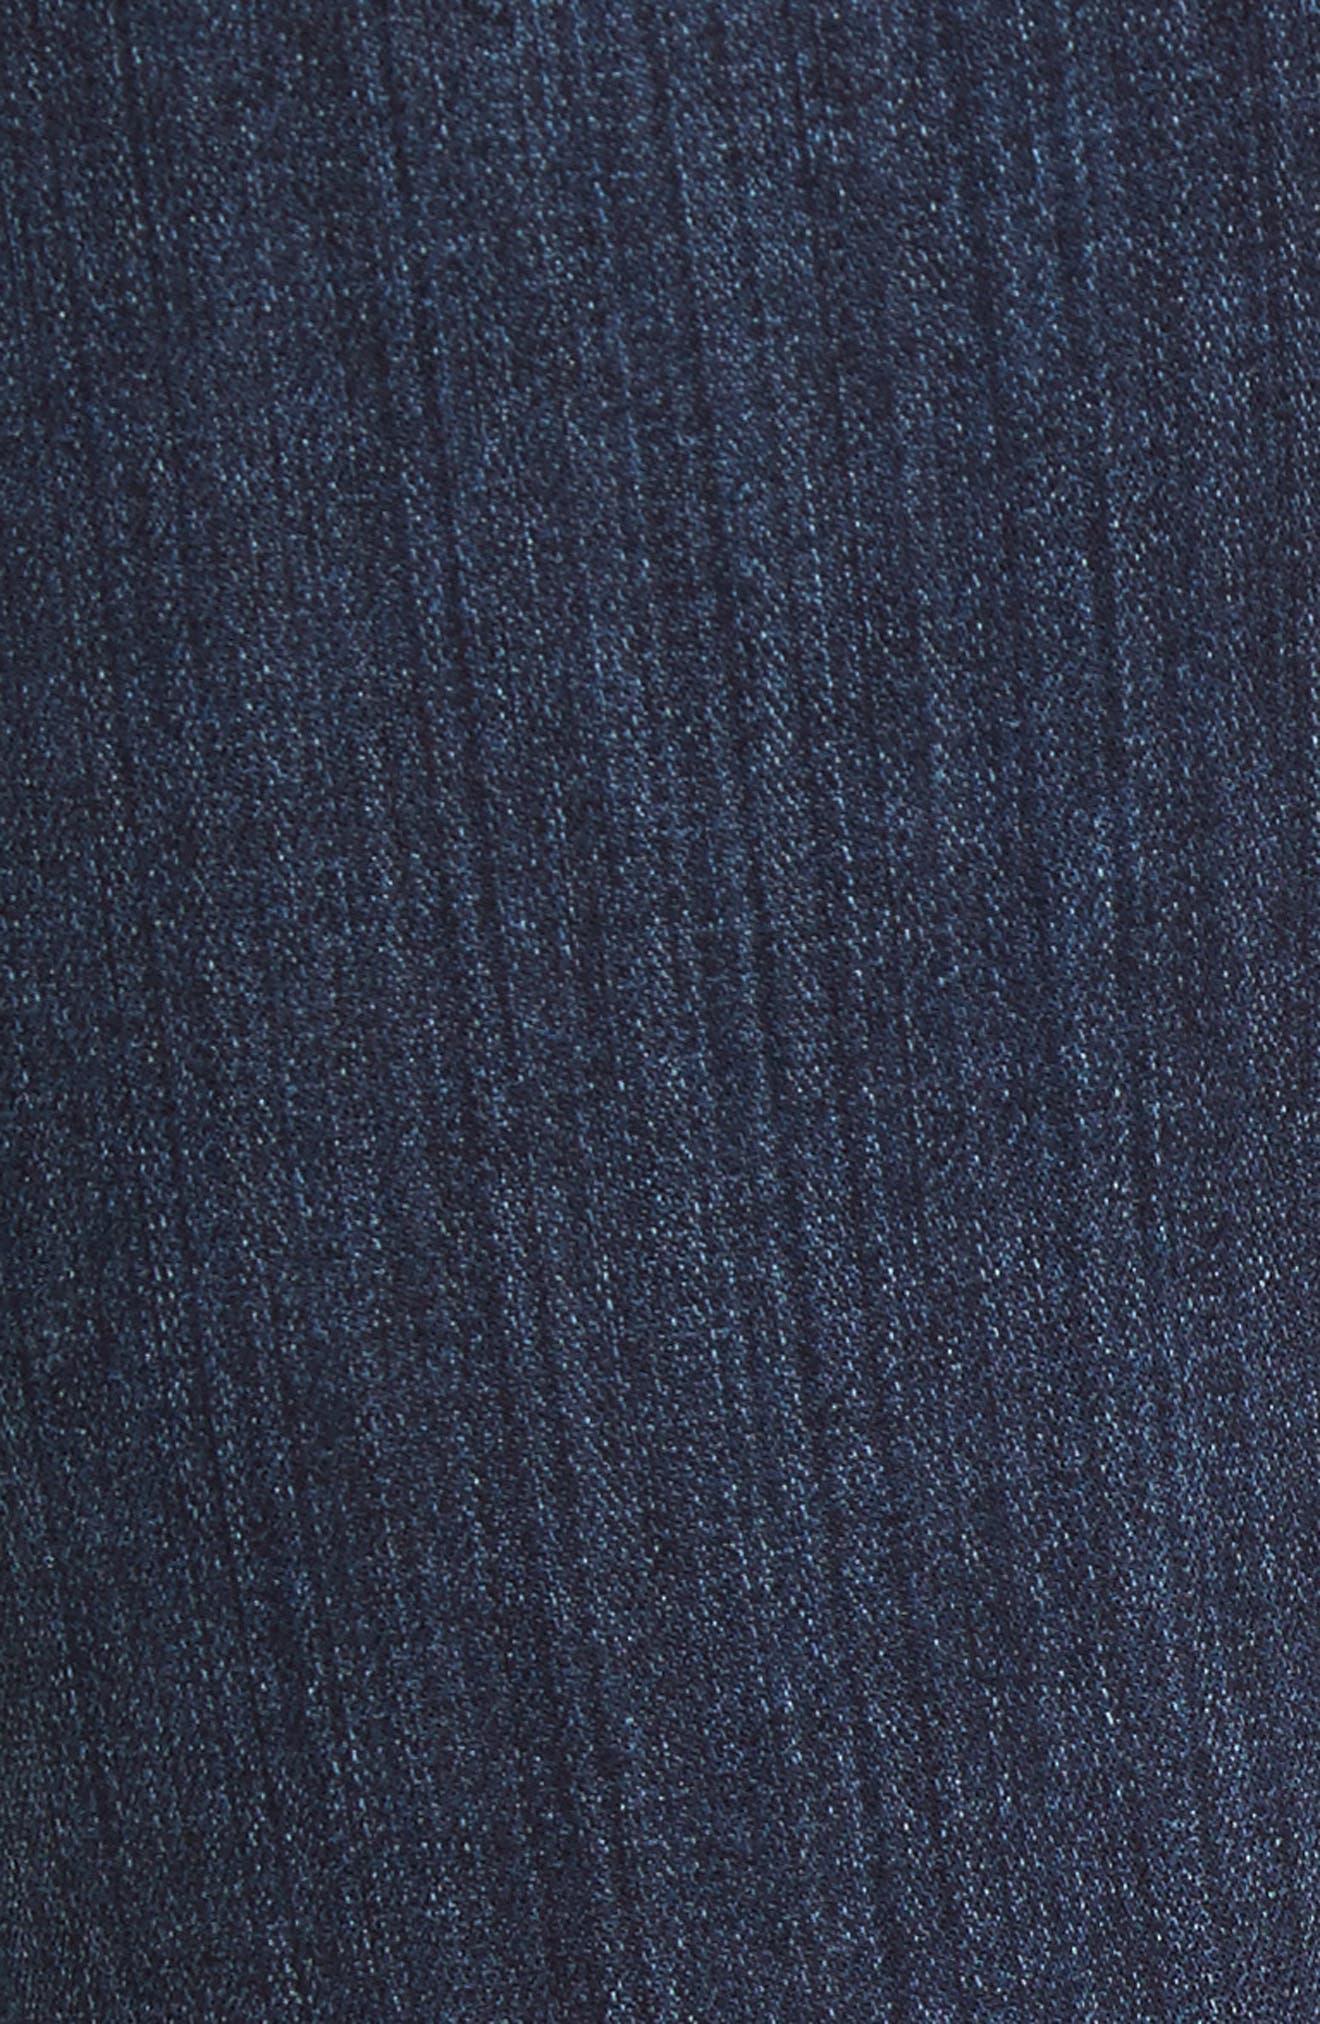 PAIGE, Hoxton High Waist Skinny Jeans, Alternate thumbnail 5, color, 400